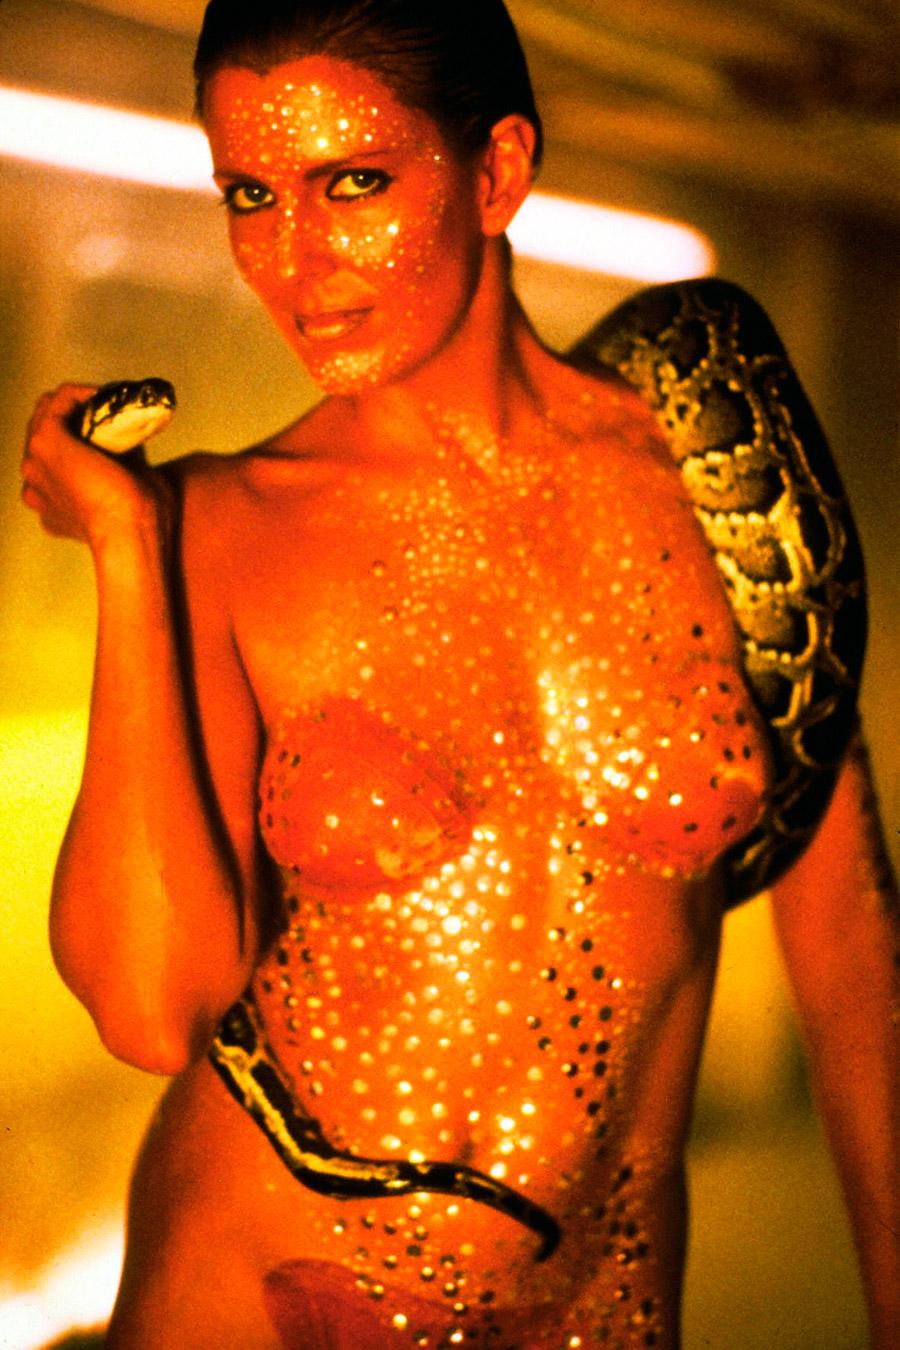 La réplicante Zhora (Joanna Cassidy) ne sort jamais sans son snake-bot, dans le film Blade Runner de Ridley Scott (1982)